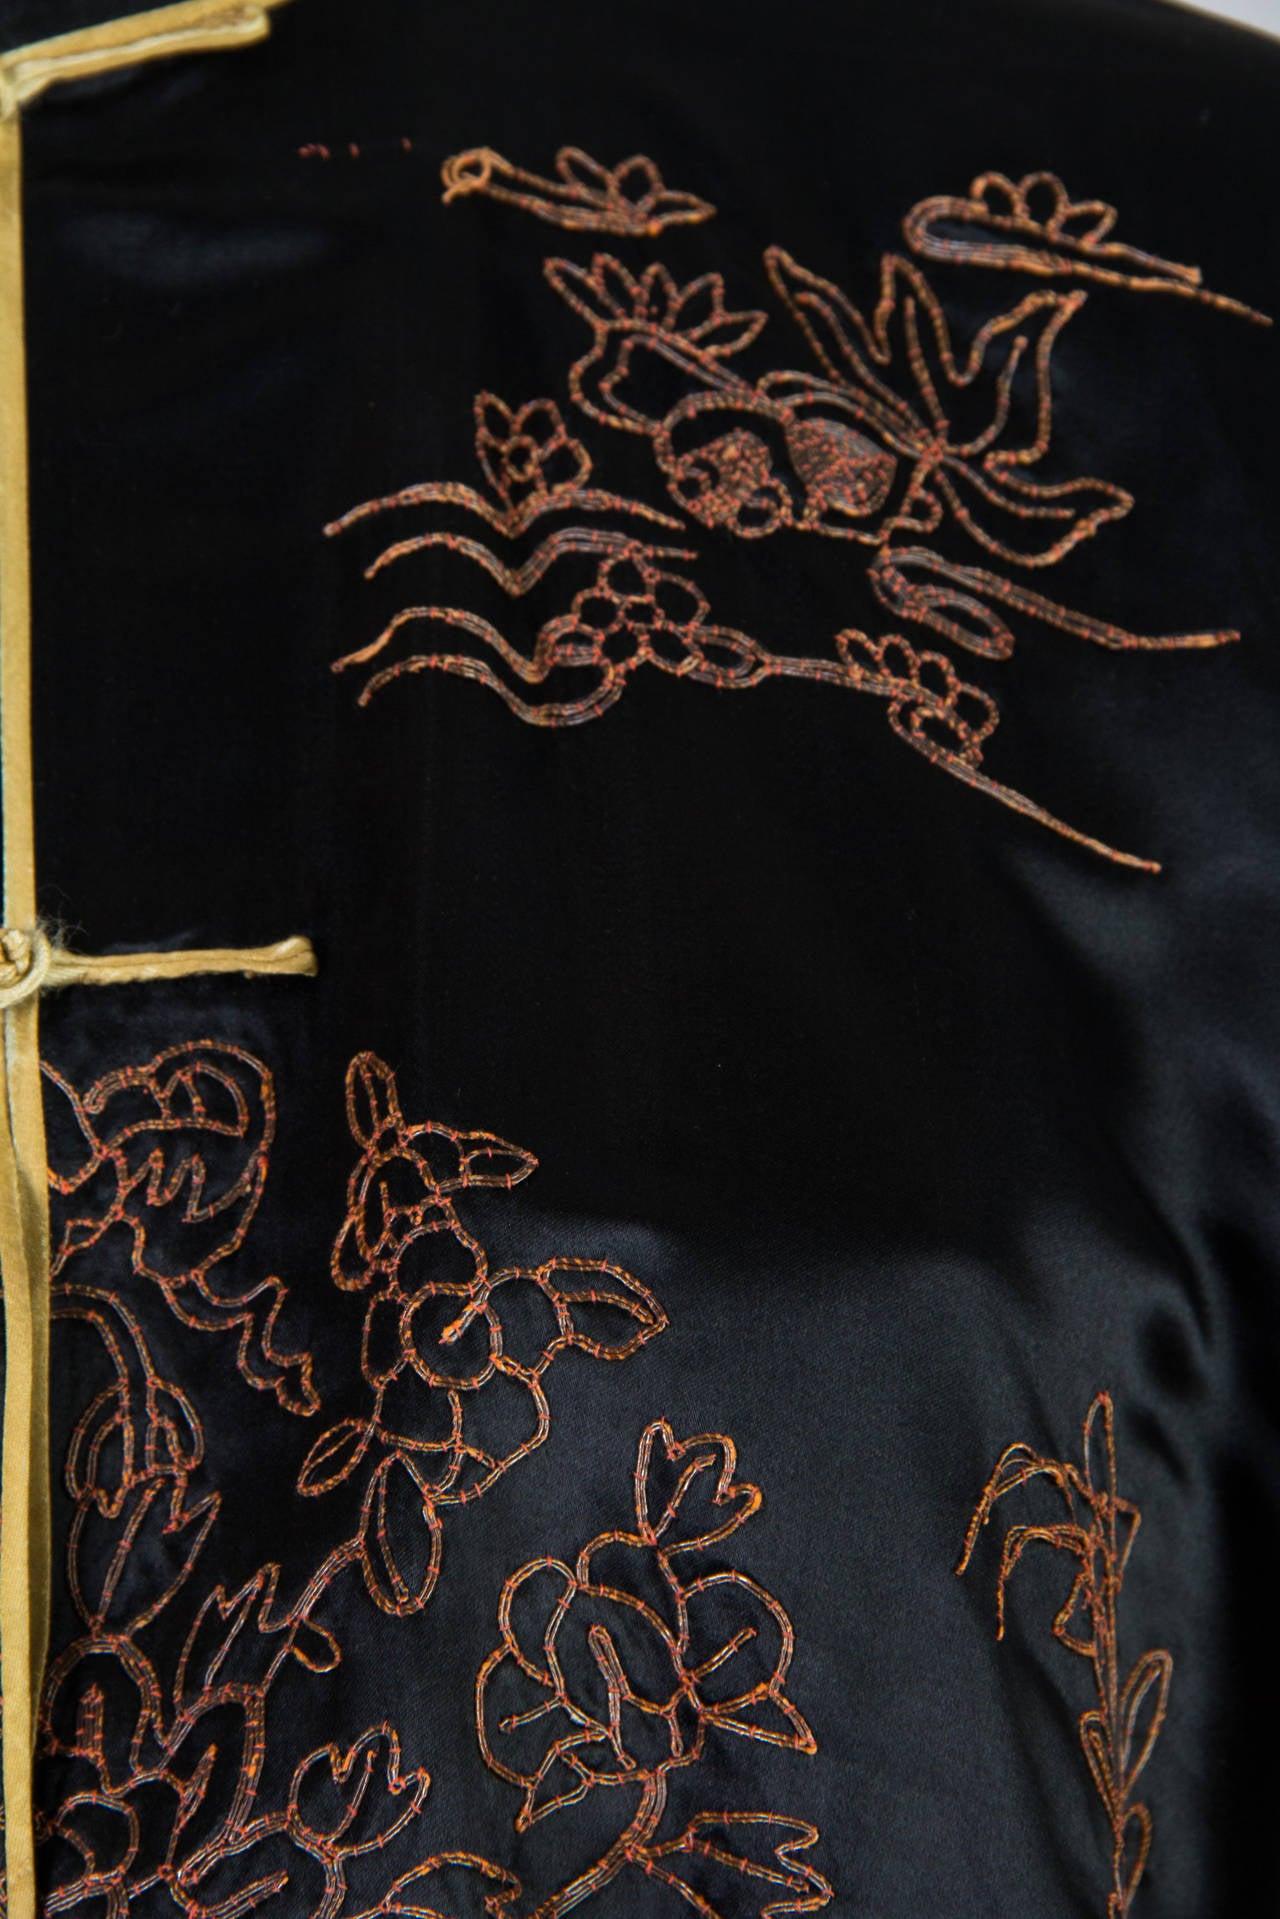 Early Chinese Embroidered Jacket Kimono style 8